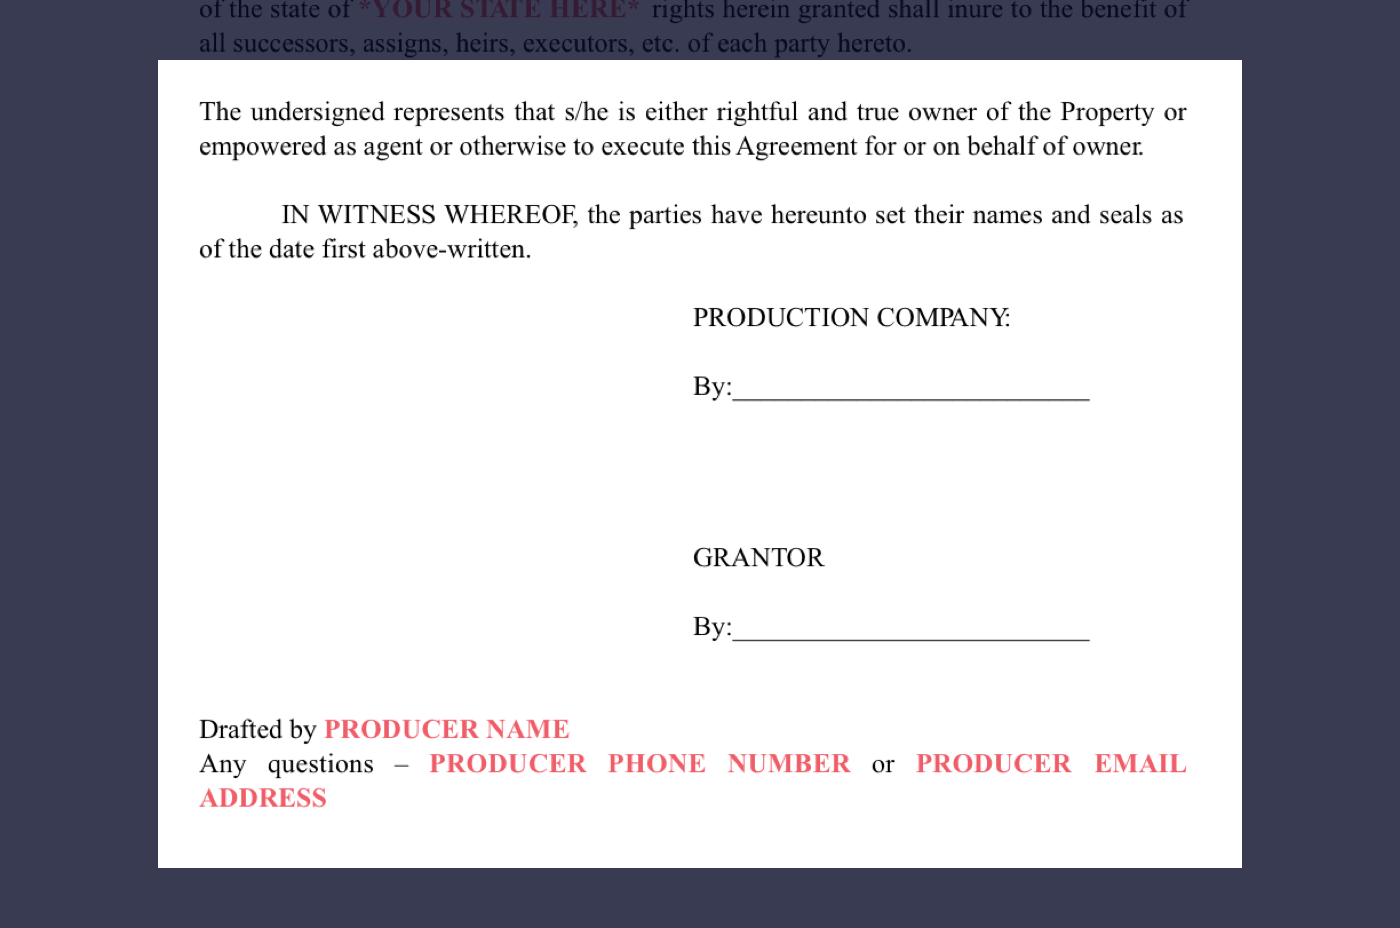 How to secure film locations free location release form 8 film location release form excerpt producers signatures falaconquin